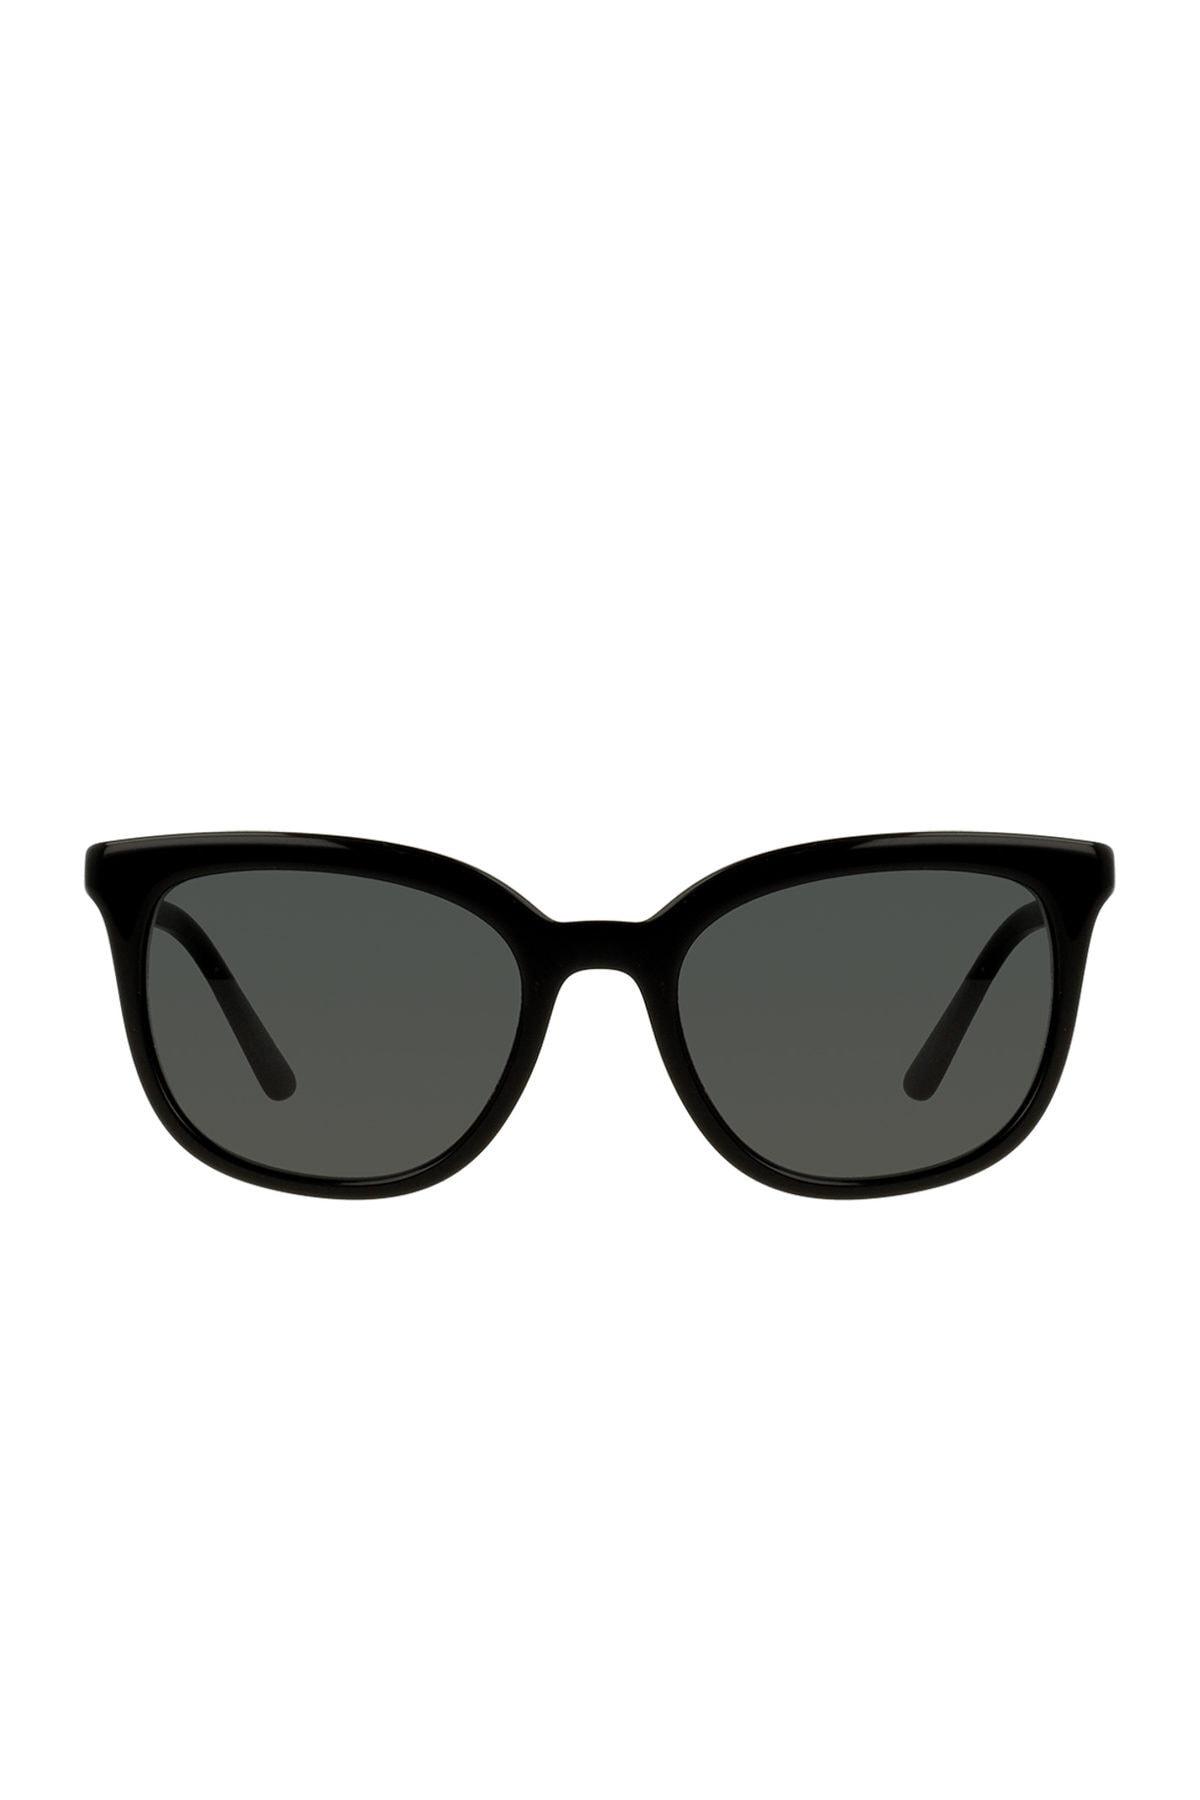 مدل عینک آفتابی 2020 برند Prada رنگ مشکی کد ty36899630